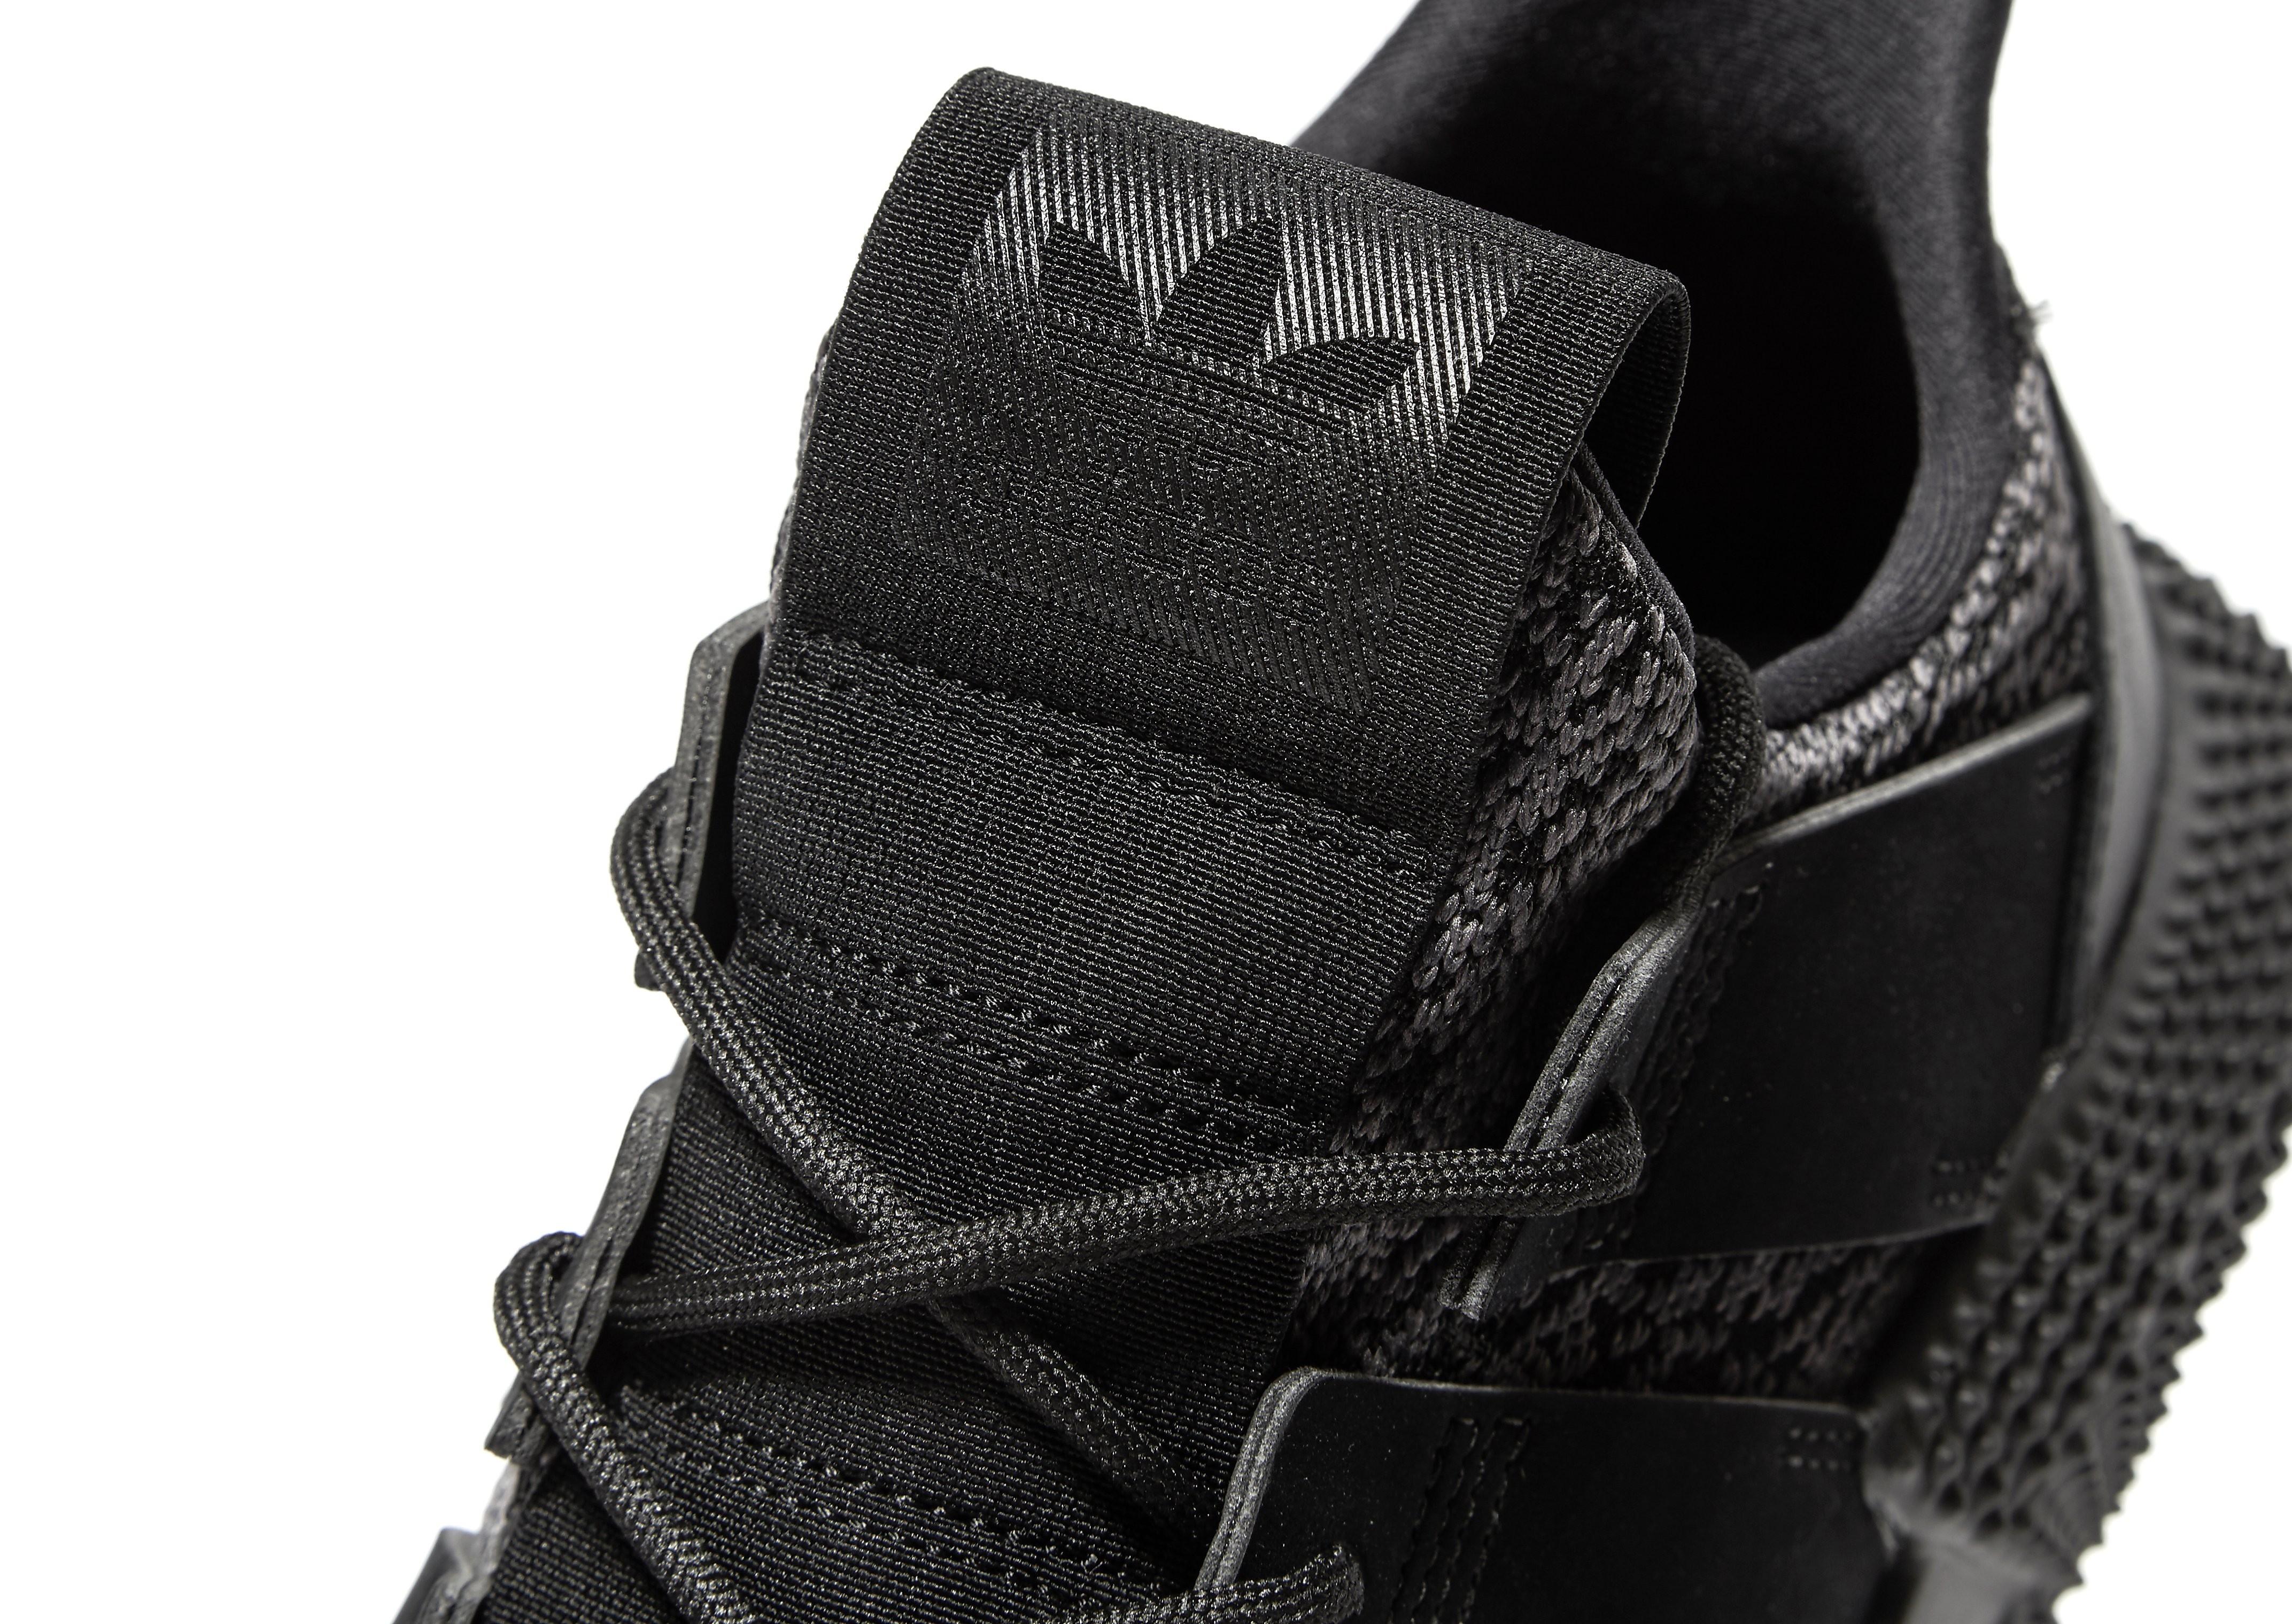 vendita adidas originali prophere jd sports